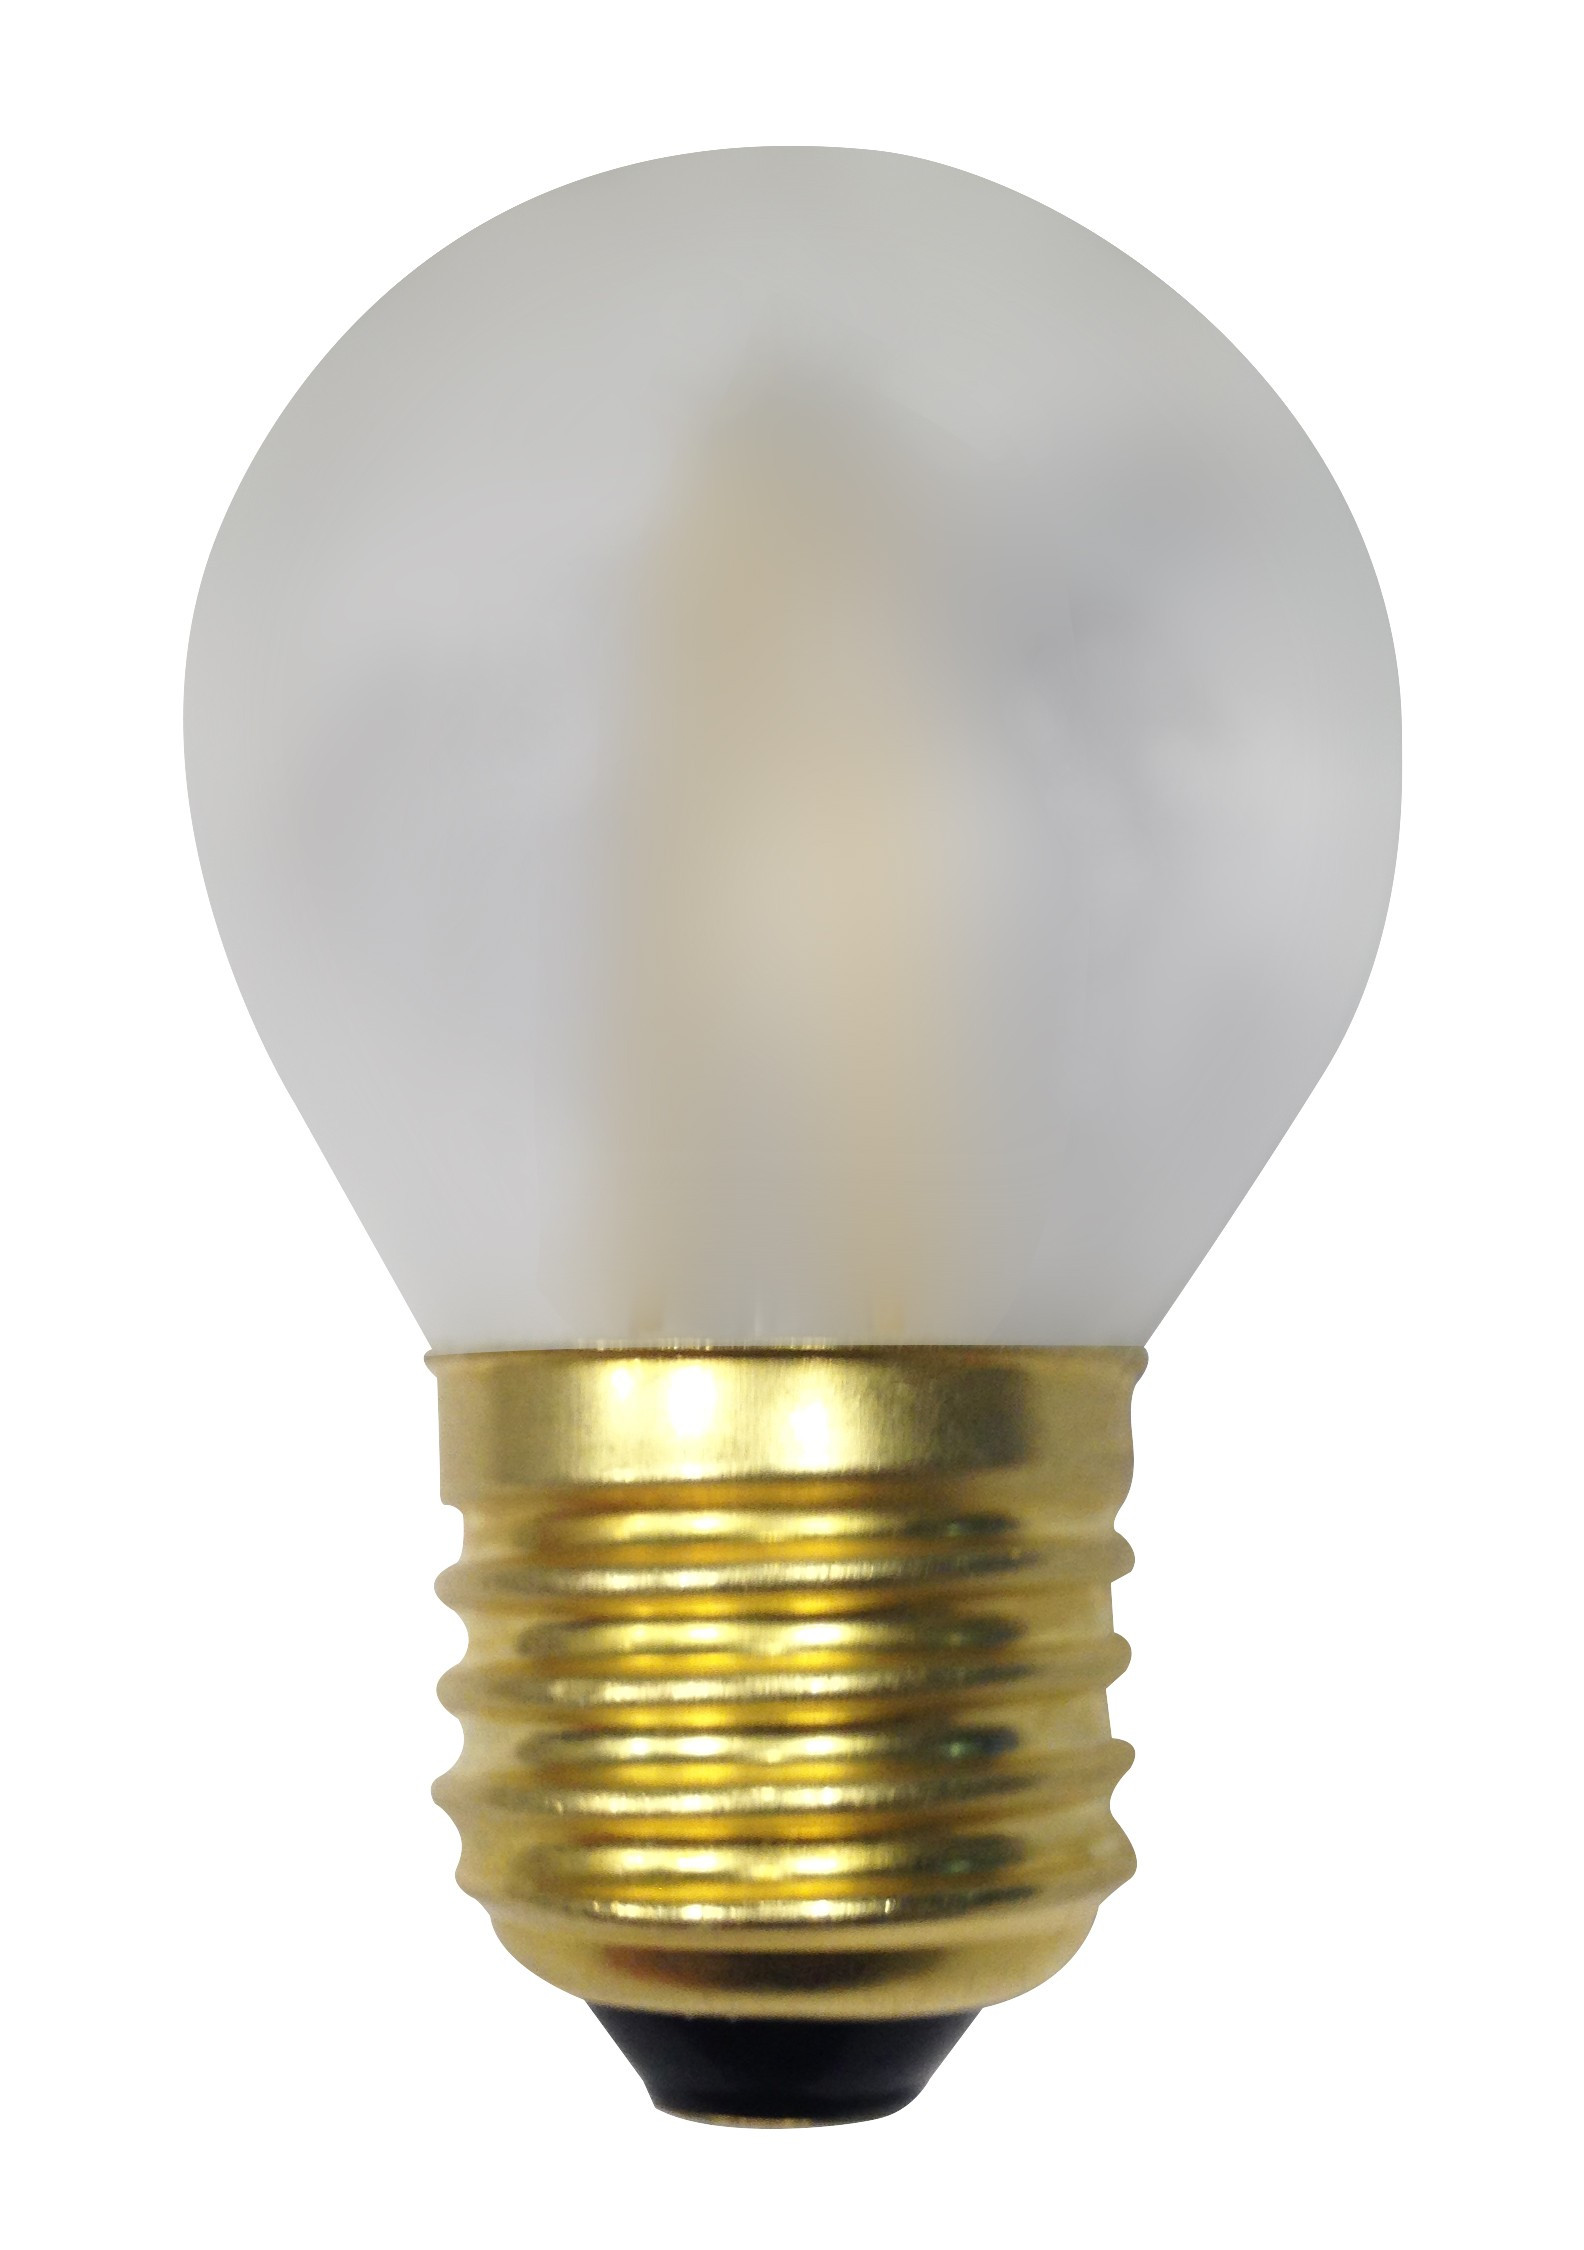 ampoule filament led 3 watt forme sph rique e27 opale depolie. Black Bedroom Furniture Sets. Home Design Ideas